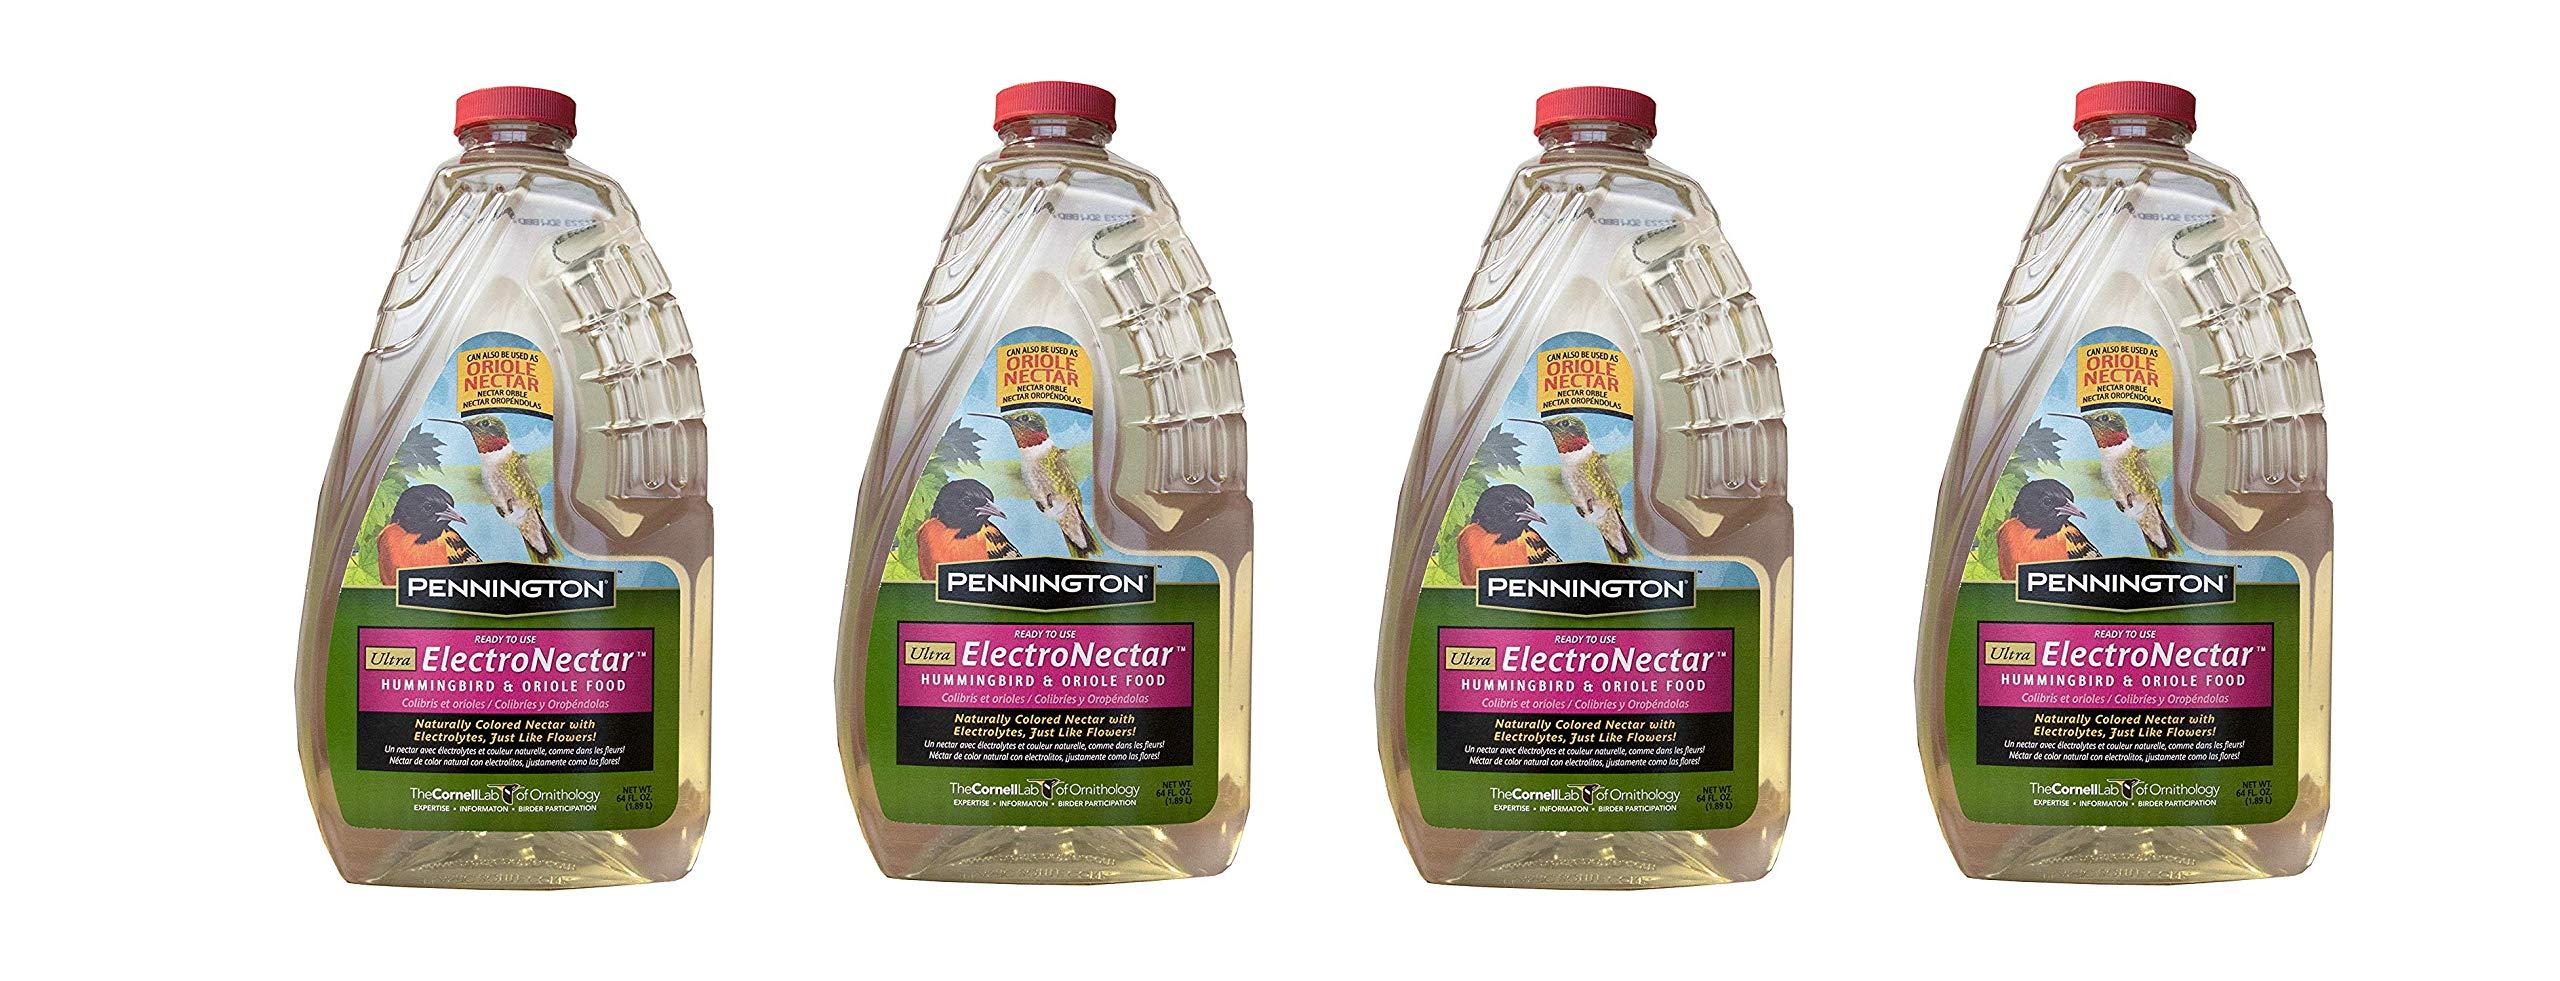 Pennington 100510152 ElectroNectar Ready to Use Hummingbird Nectar, 64 oz Clear (4-Pack)